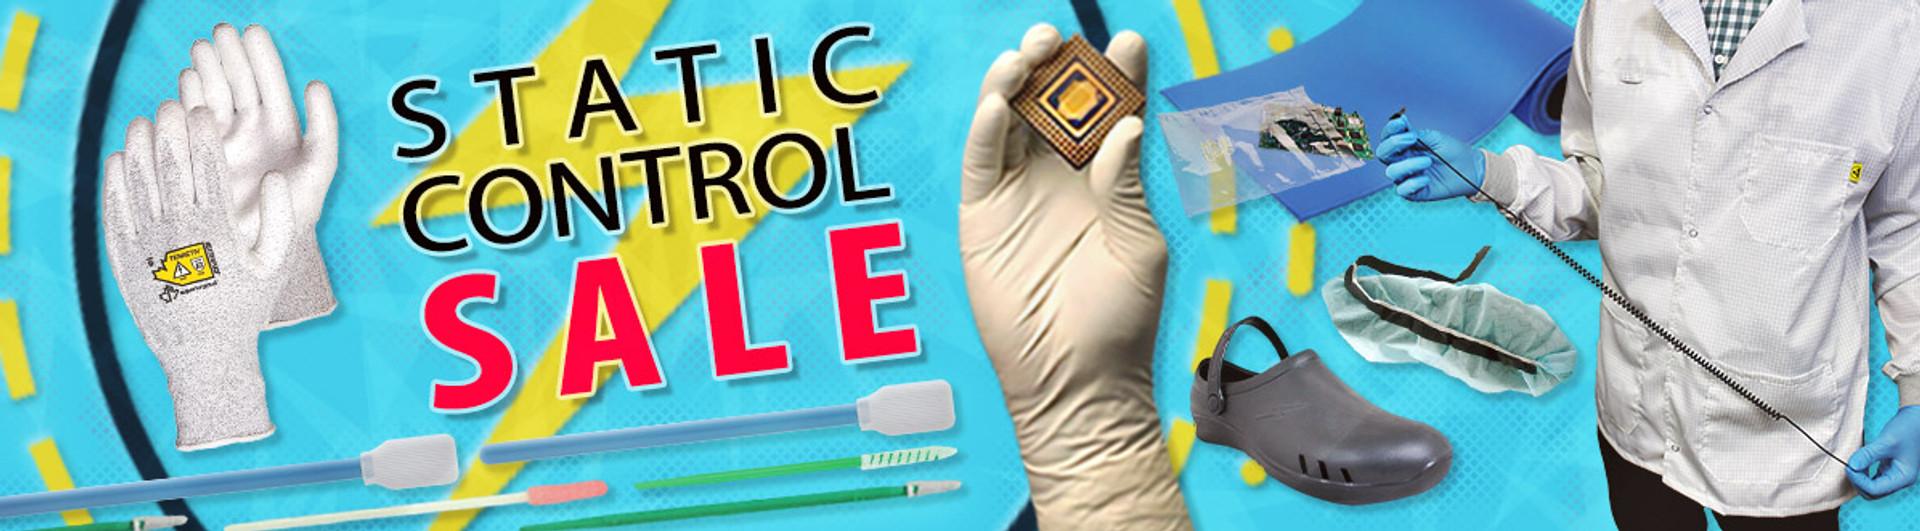 ESD Static Control Sale